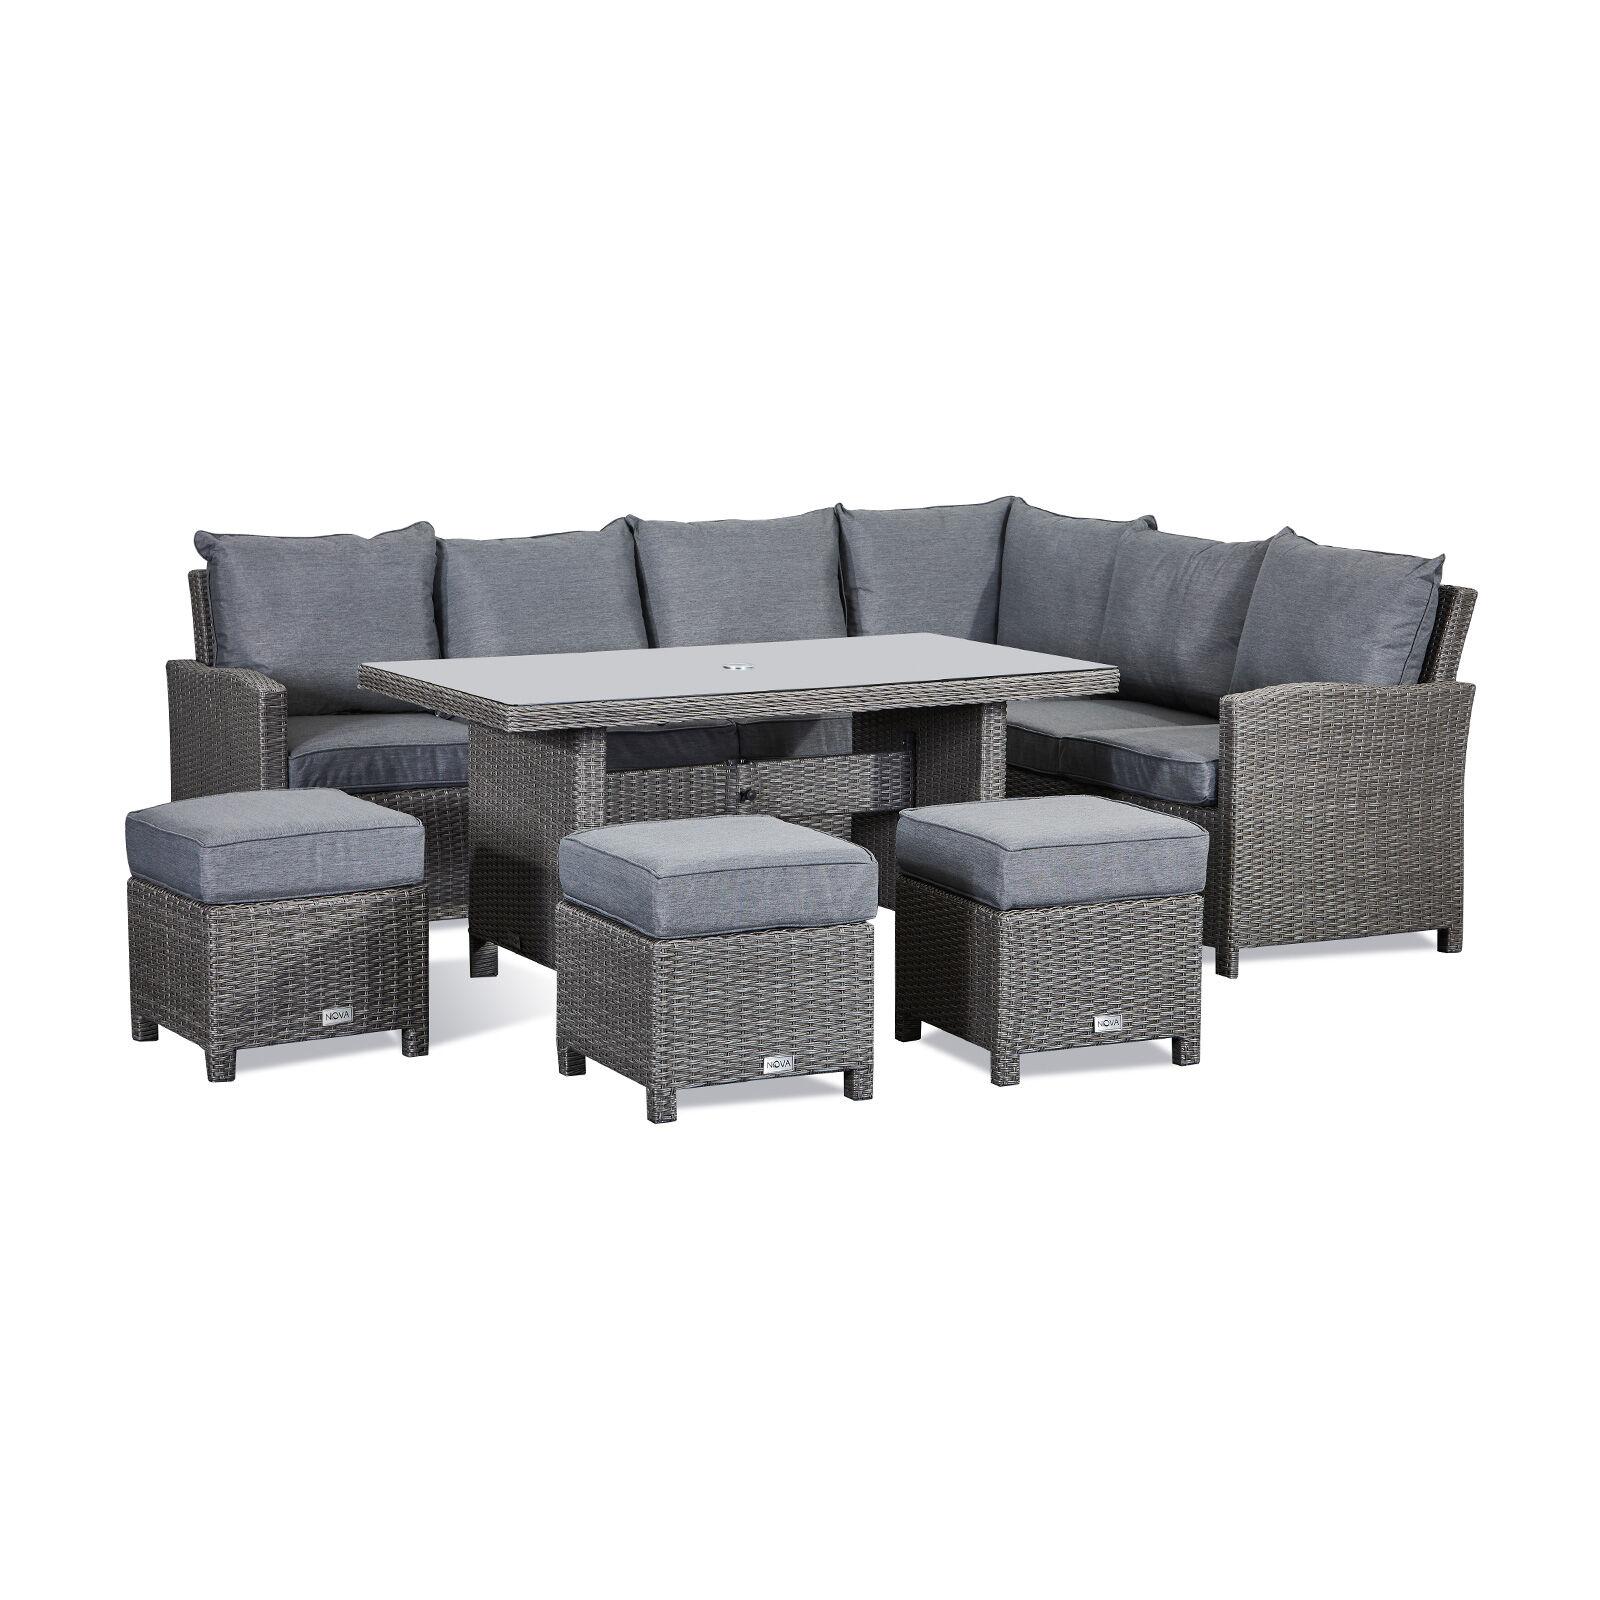 Oakworld Alfresco Heritage Ciara Corner Dining Set with Parasol Hole Table   Right Hand   Slate Grey